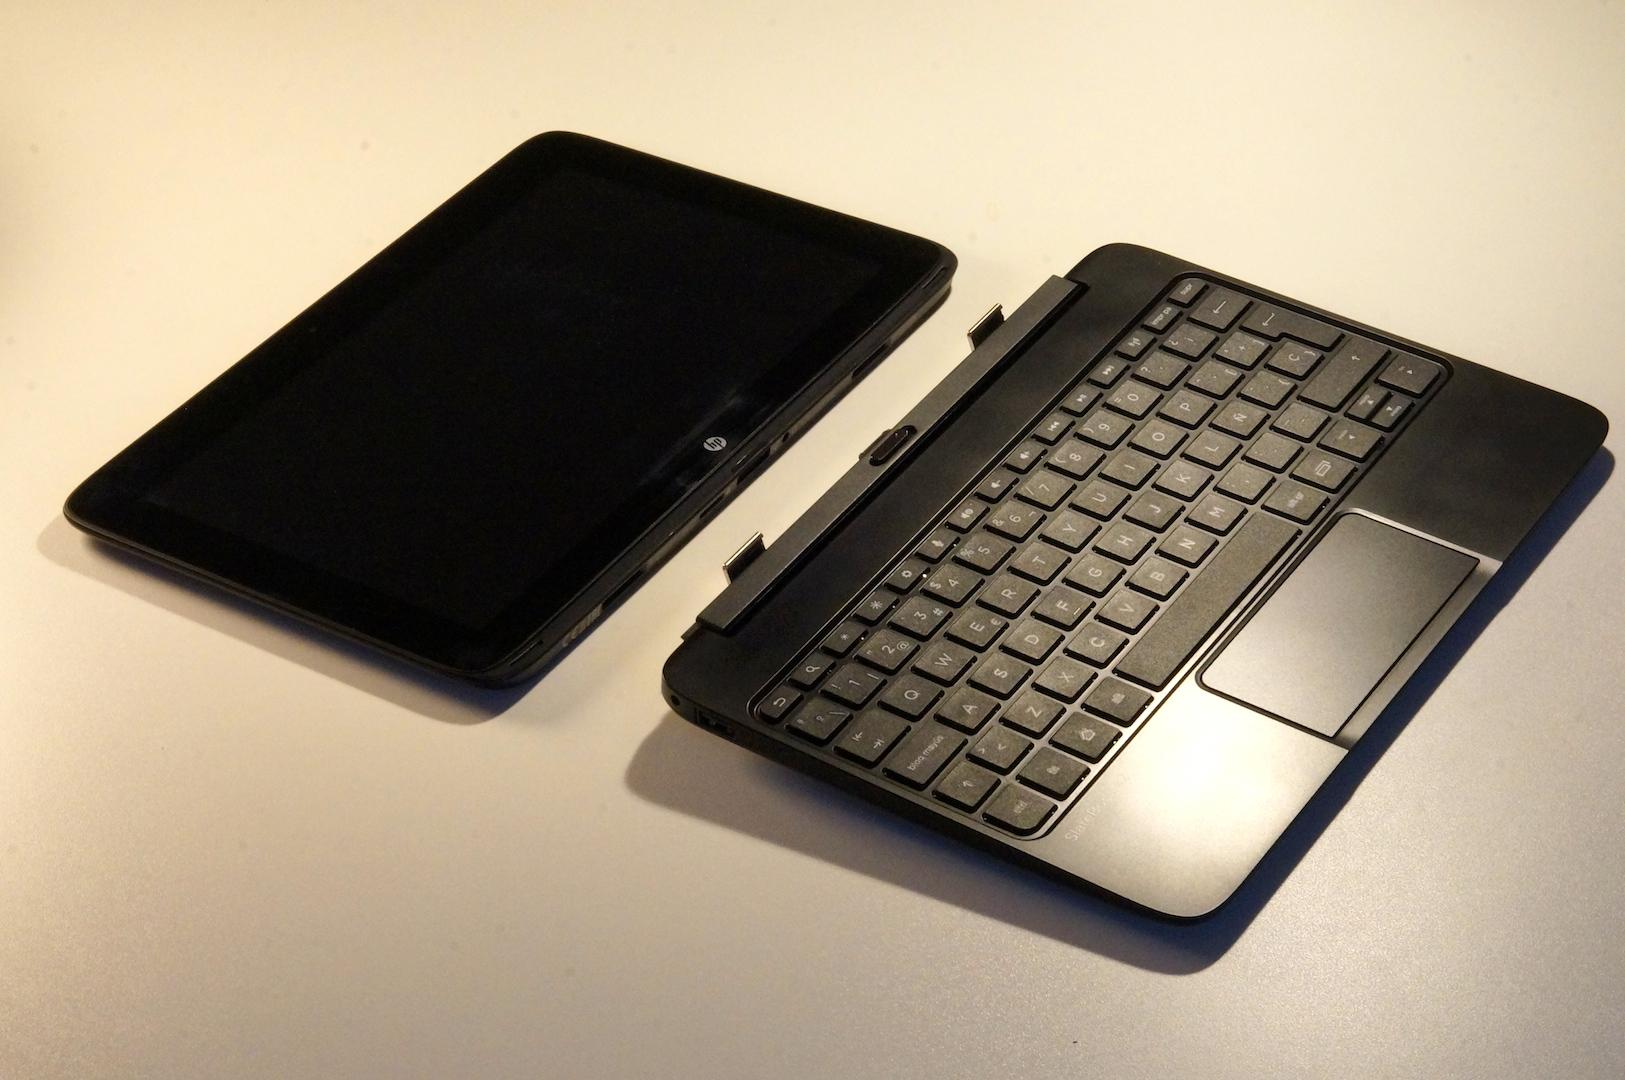 HP SlateBook X2 - Separados